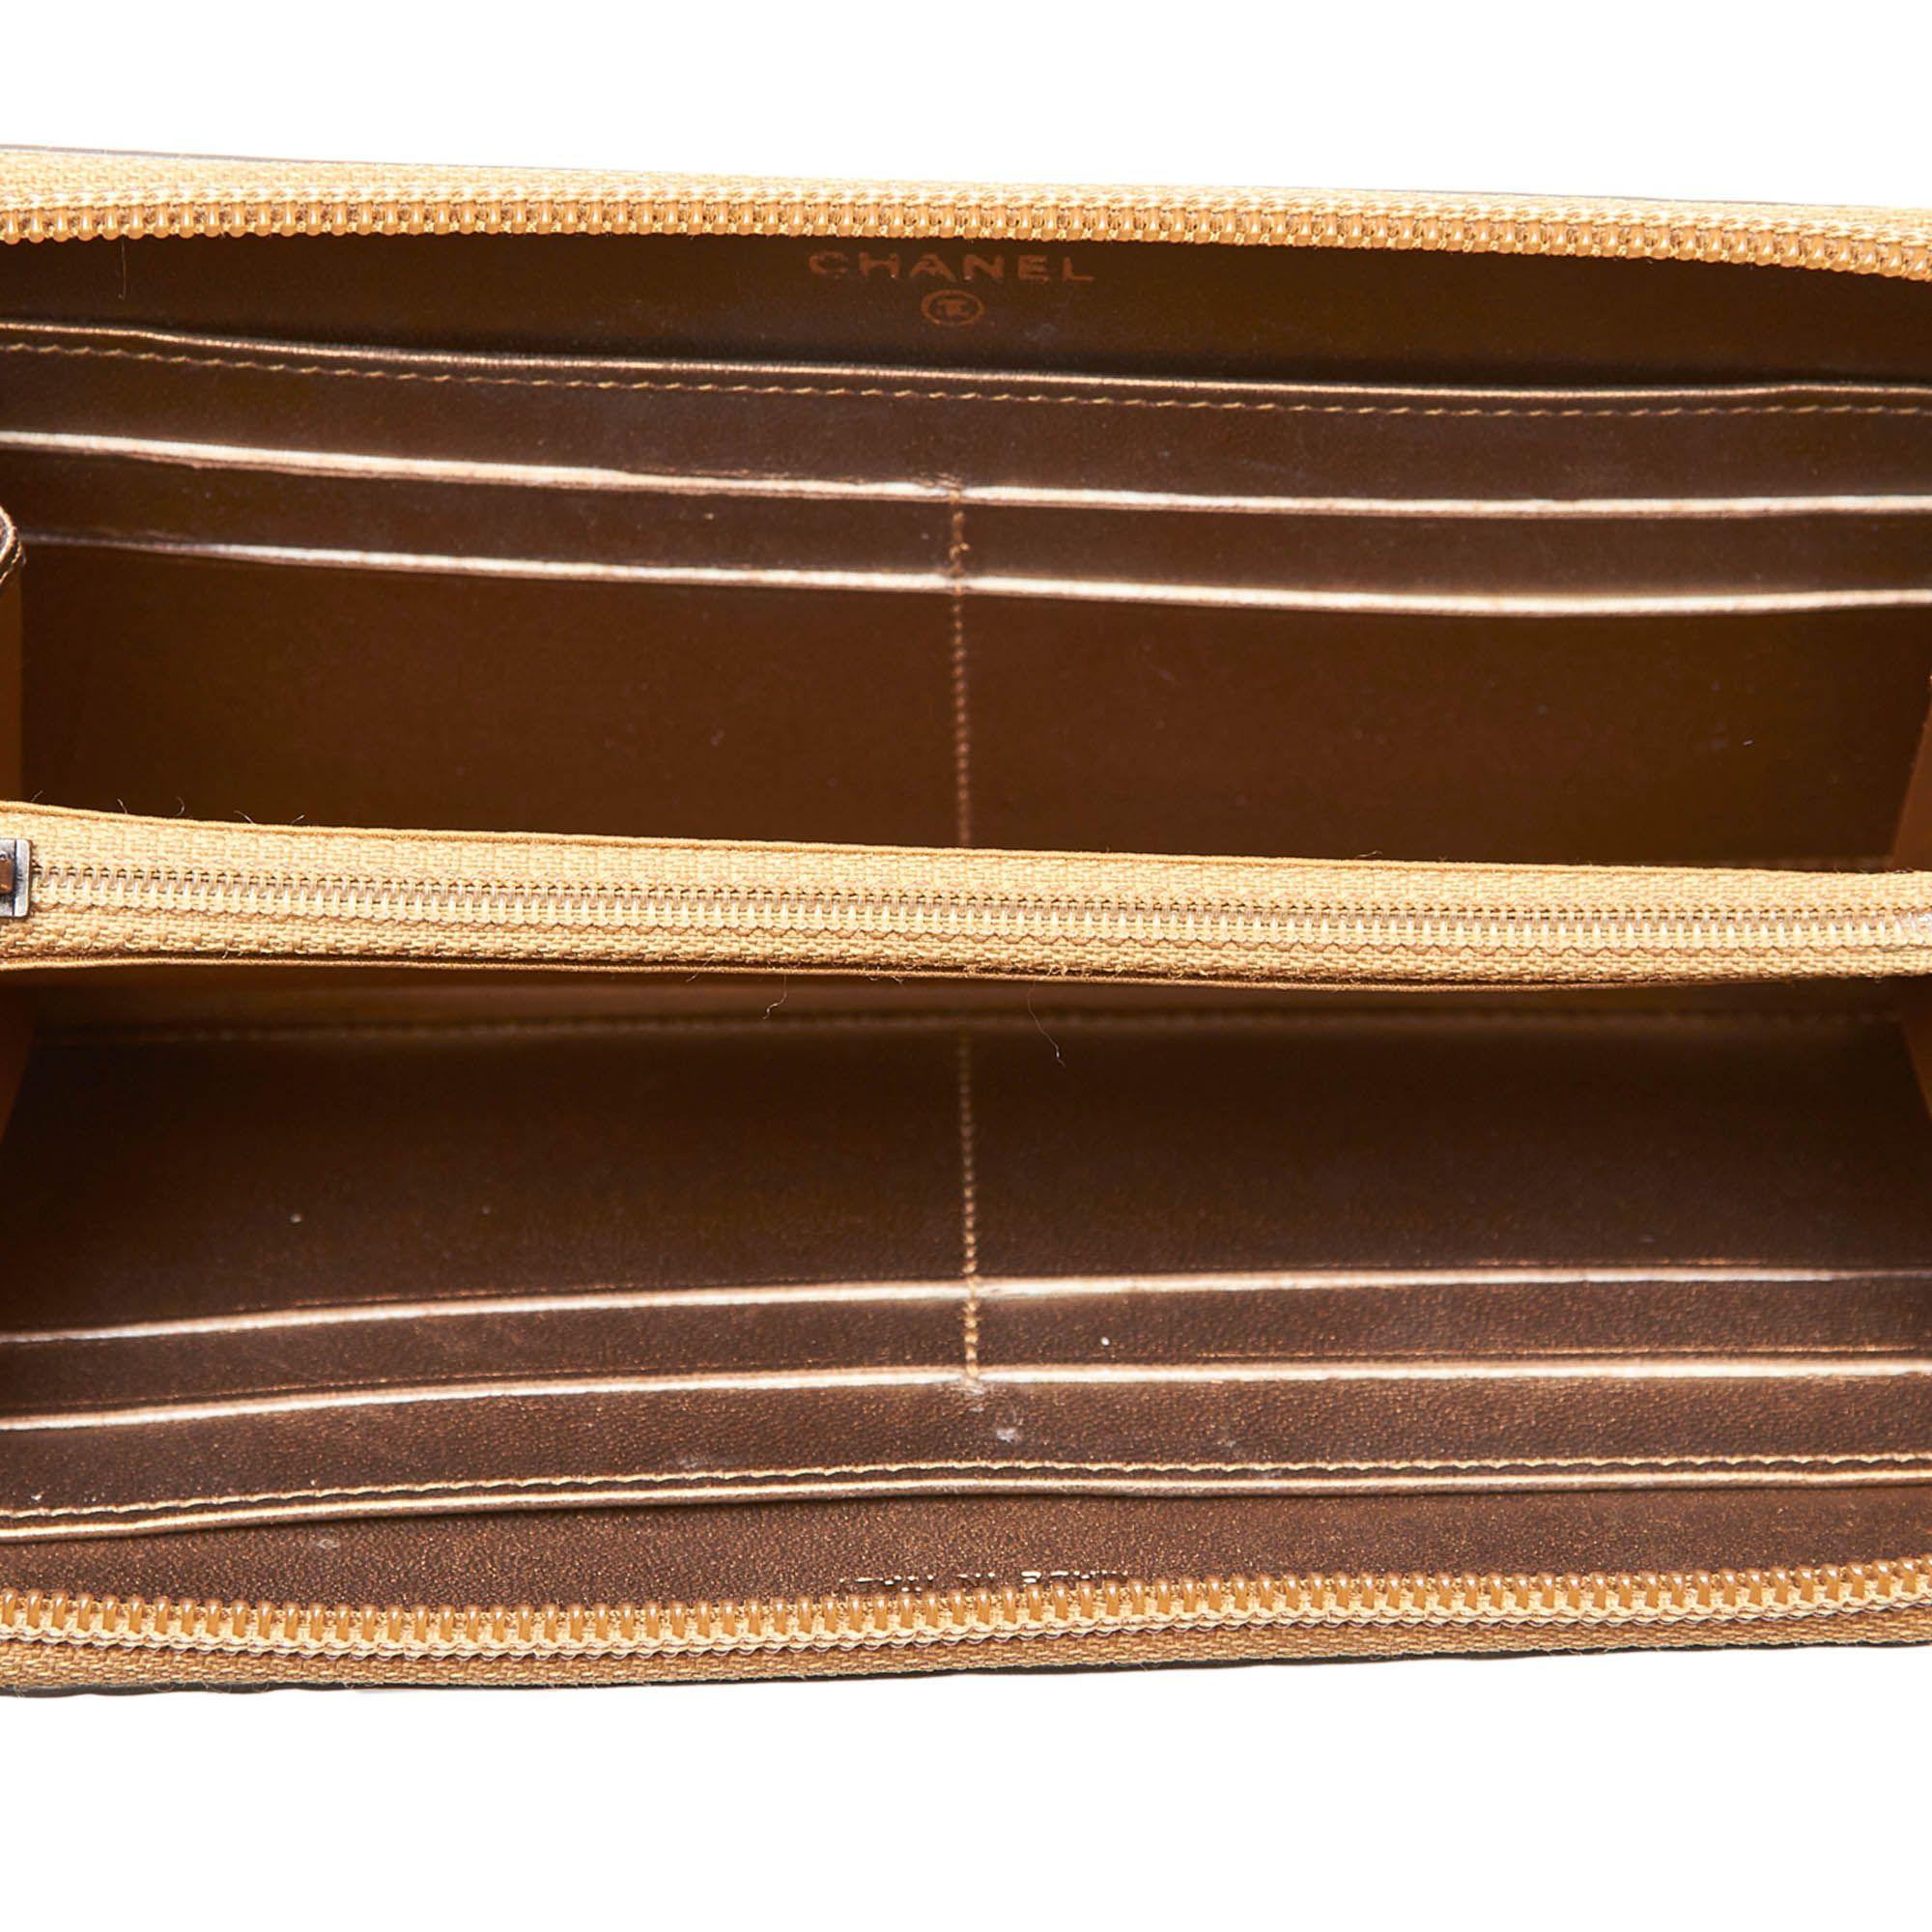 Vintage Chanel Embossed Leather Long Wallet Brown